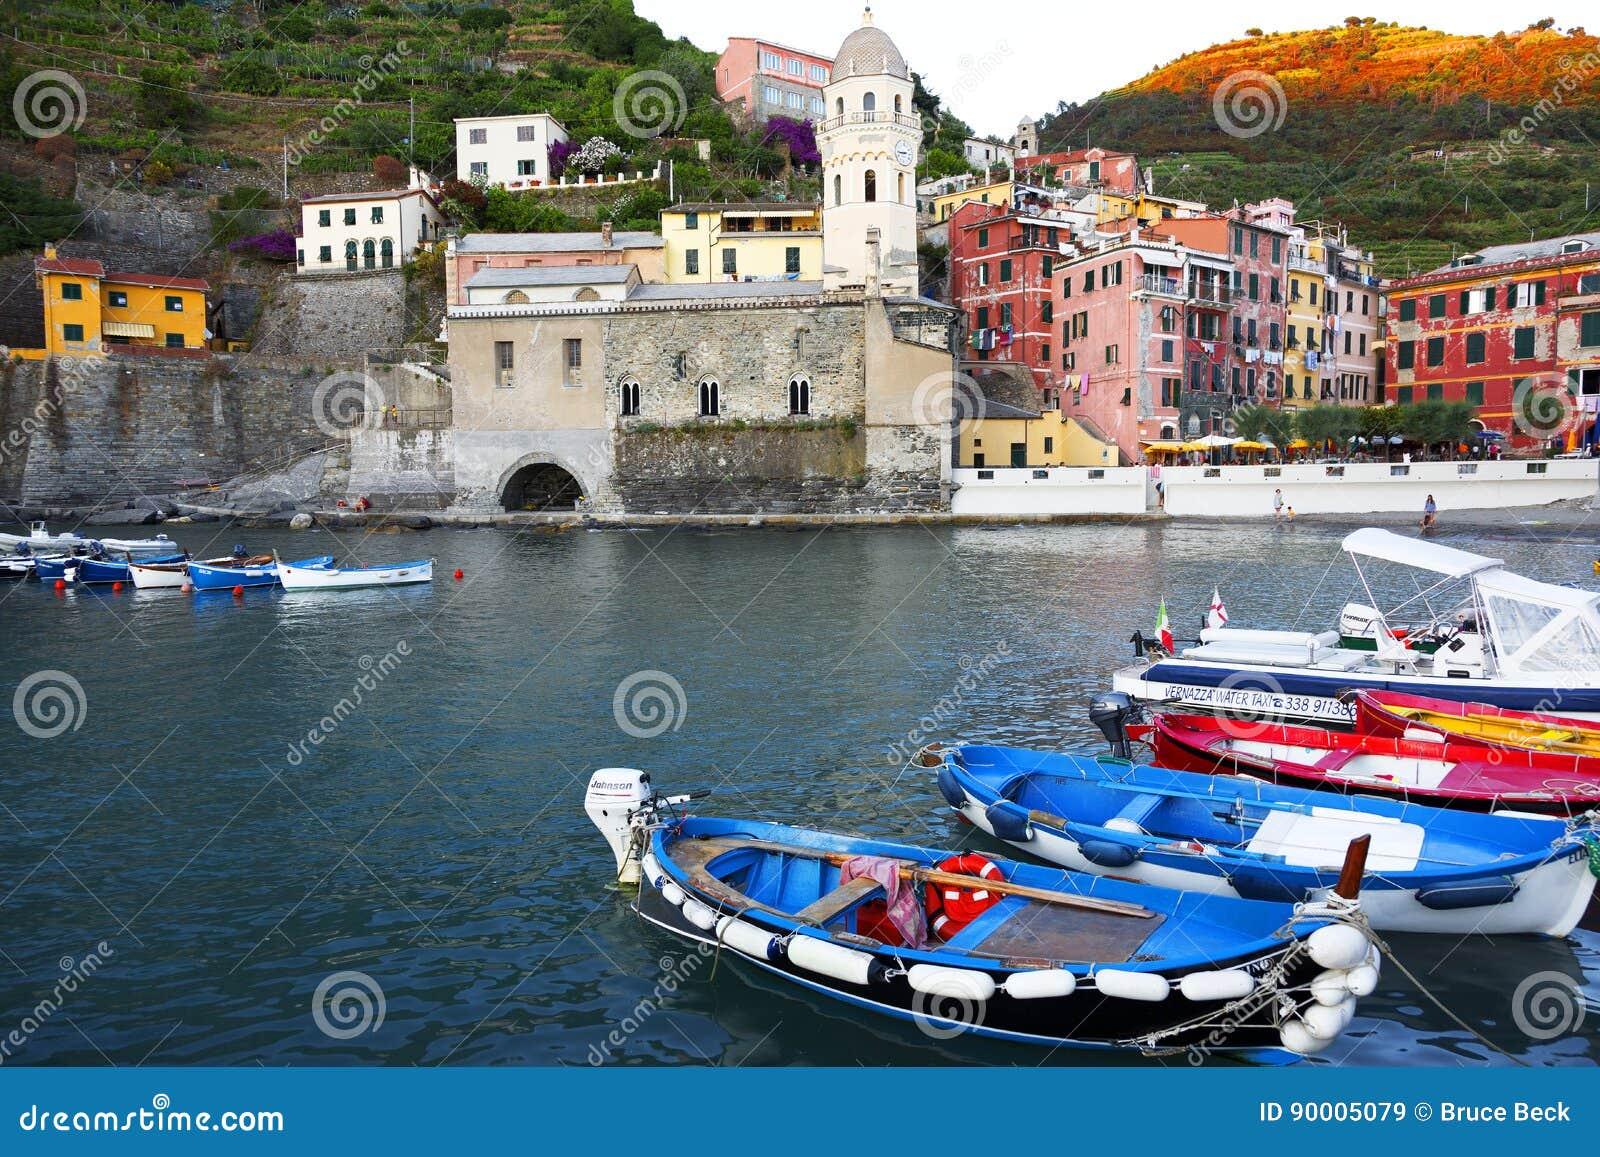 Boats, Vernazza, Cinque Terra, Italy